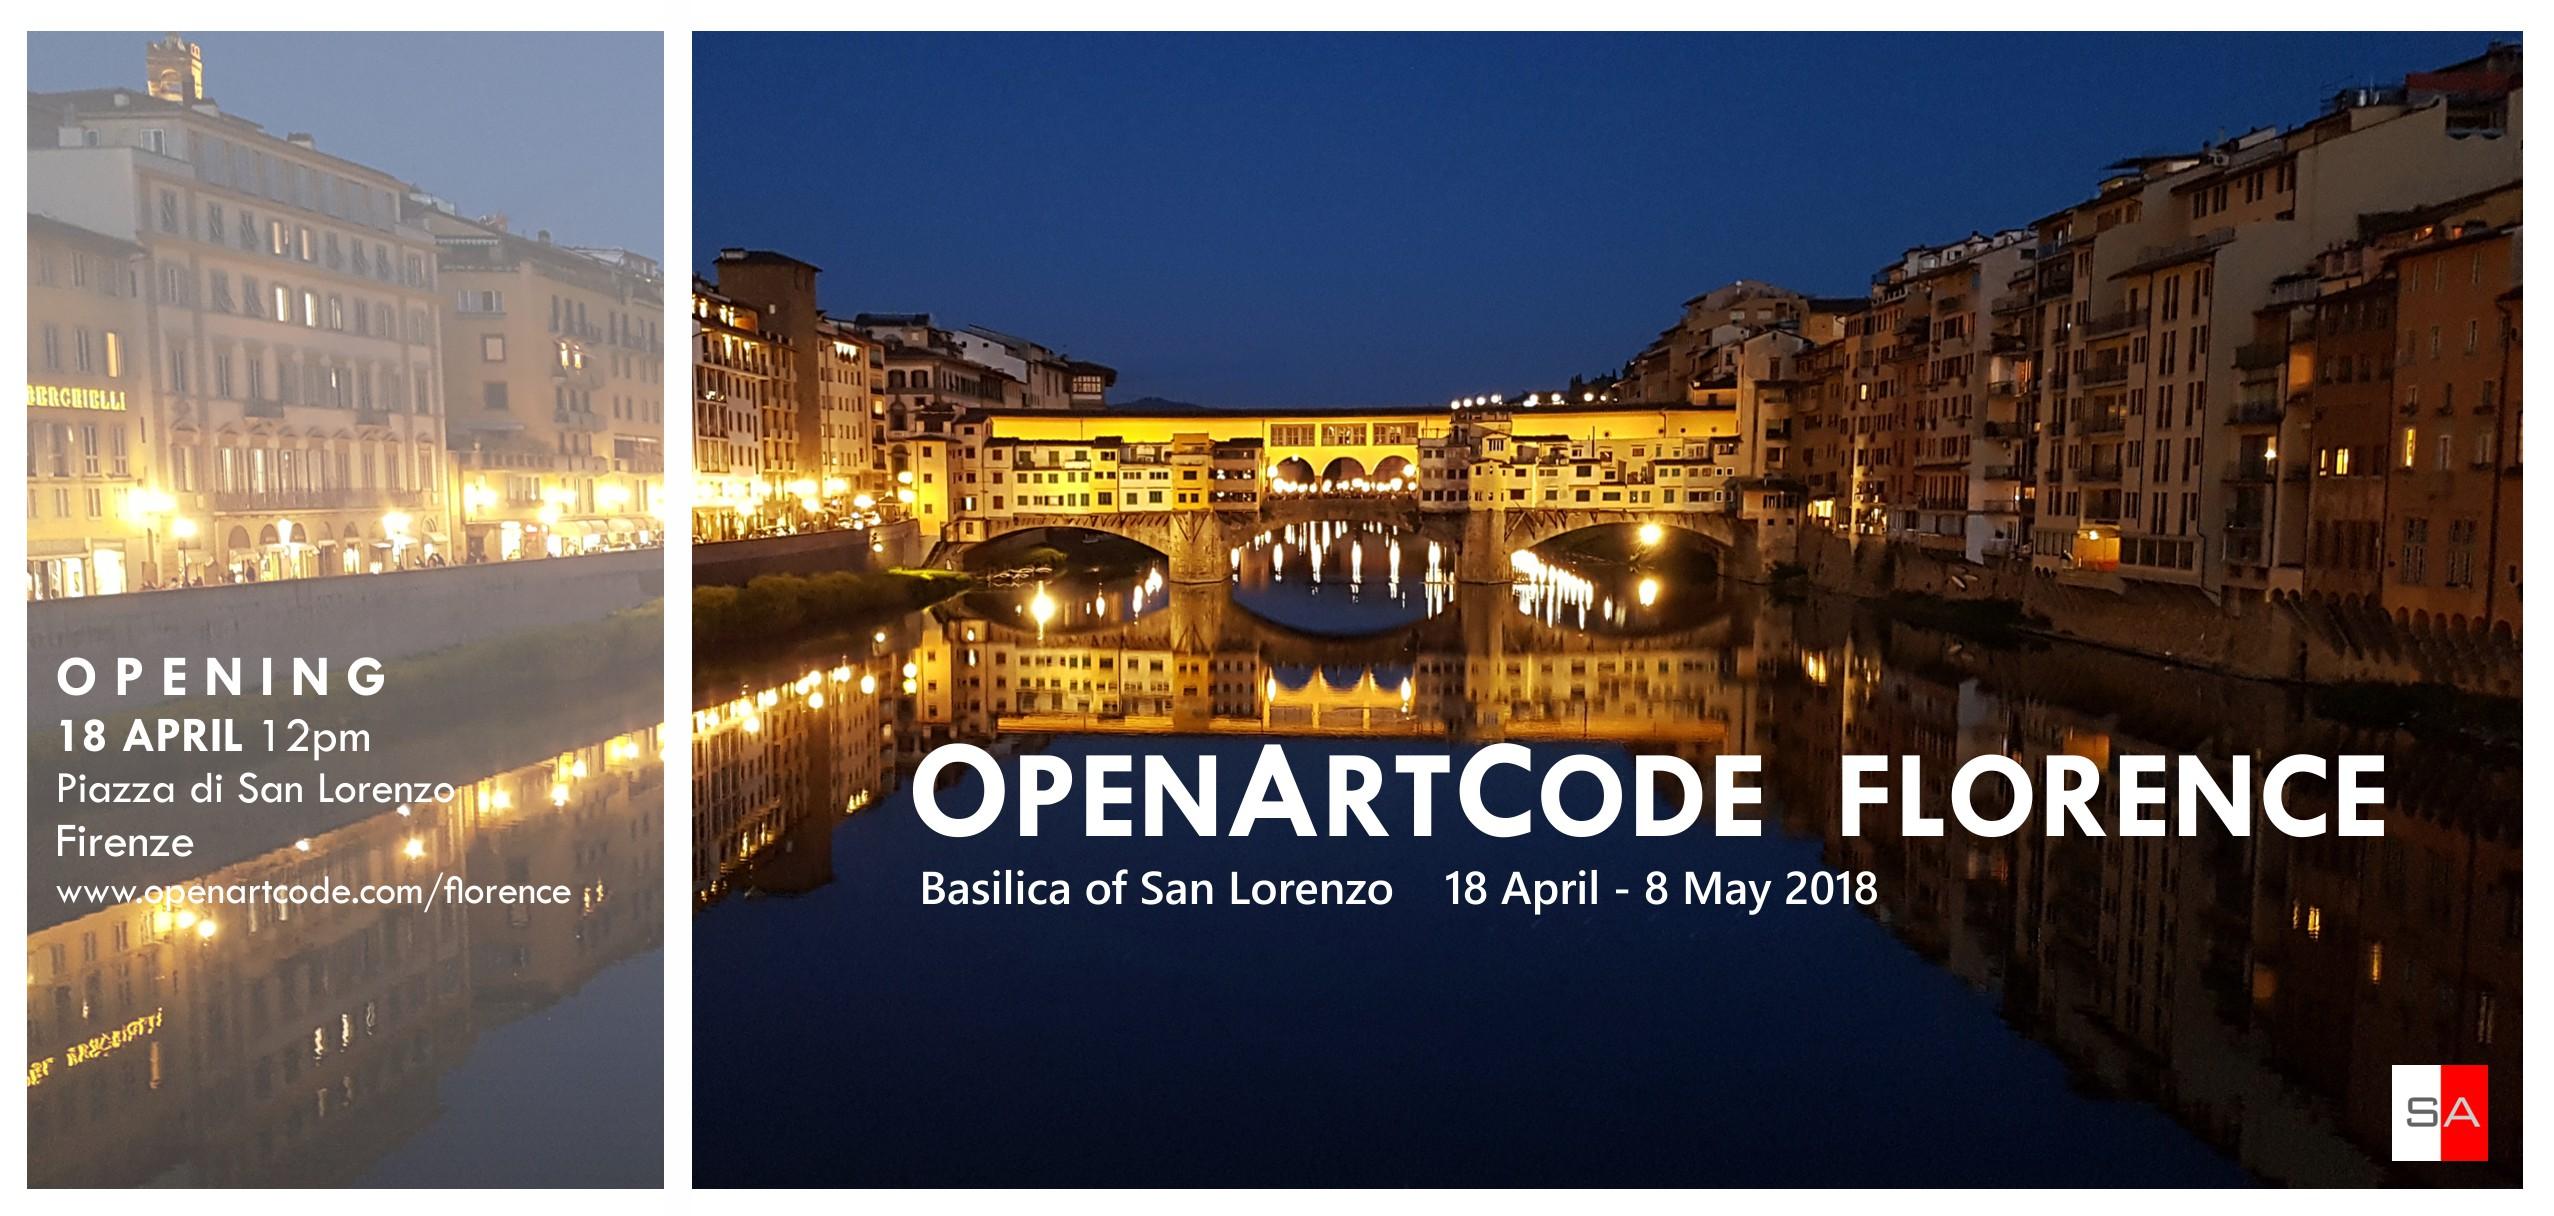 OpenArtCode-Florence-invitation